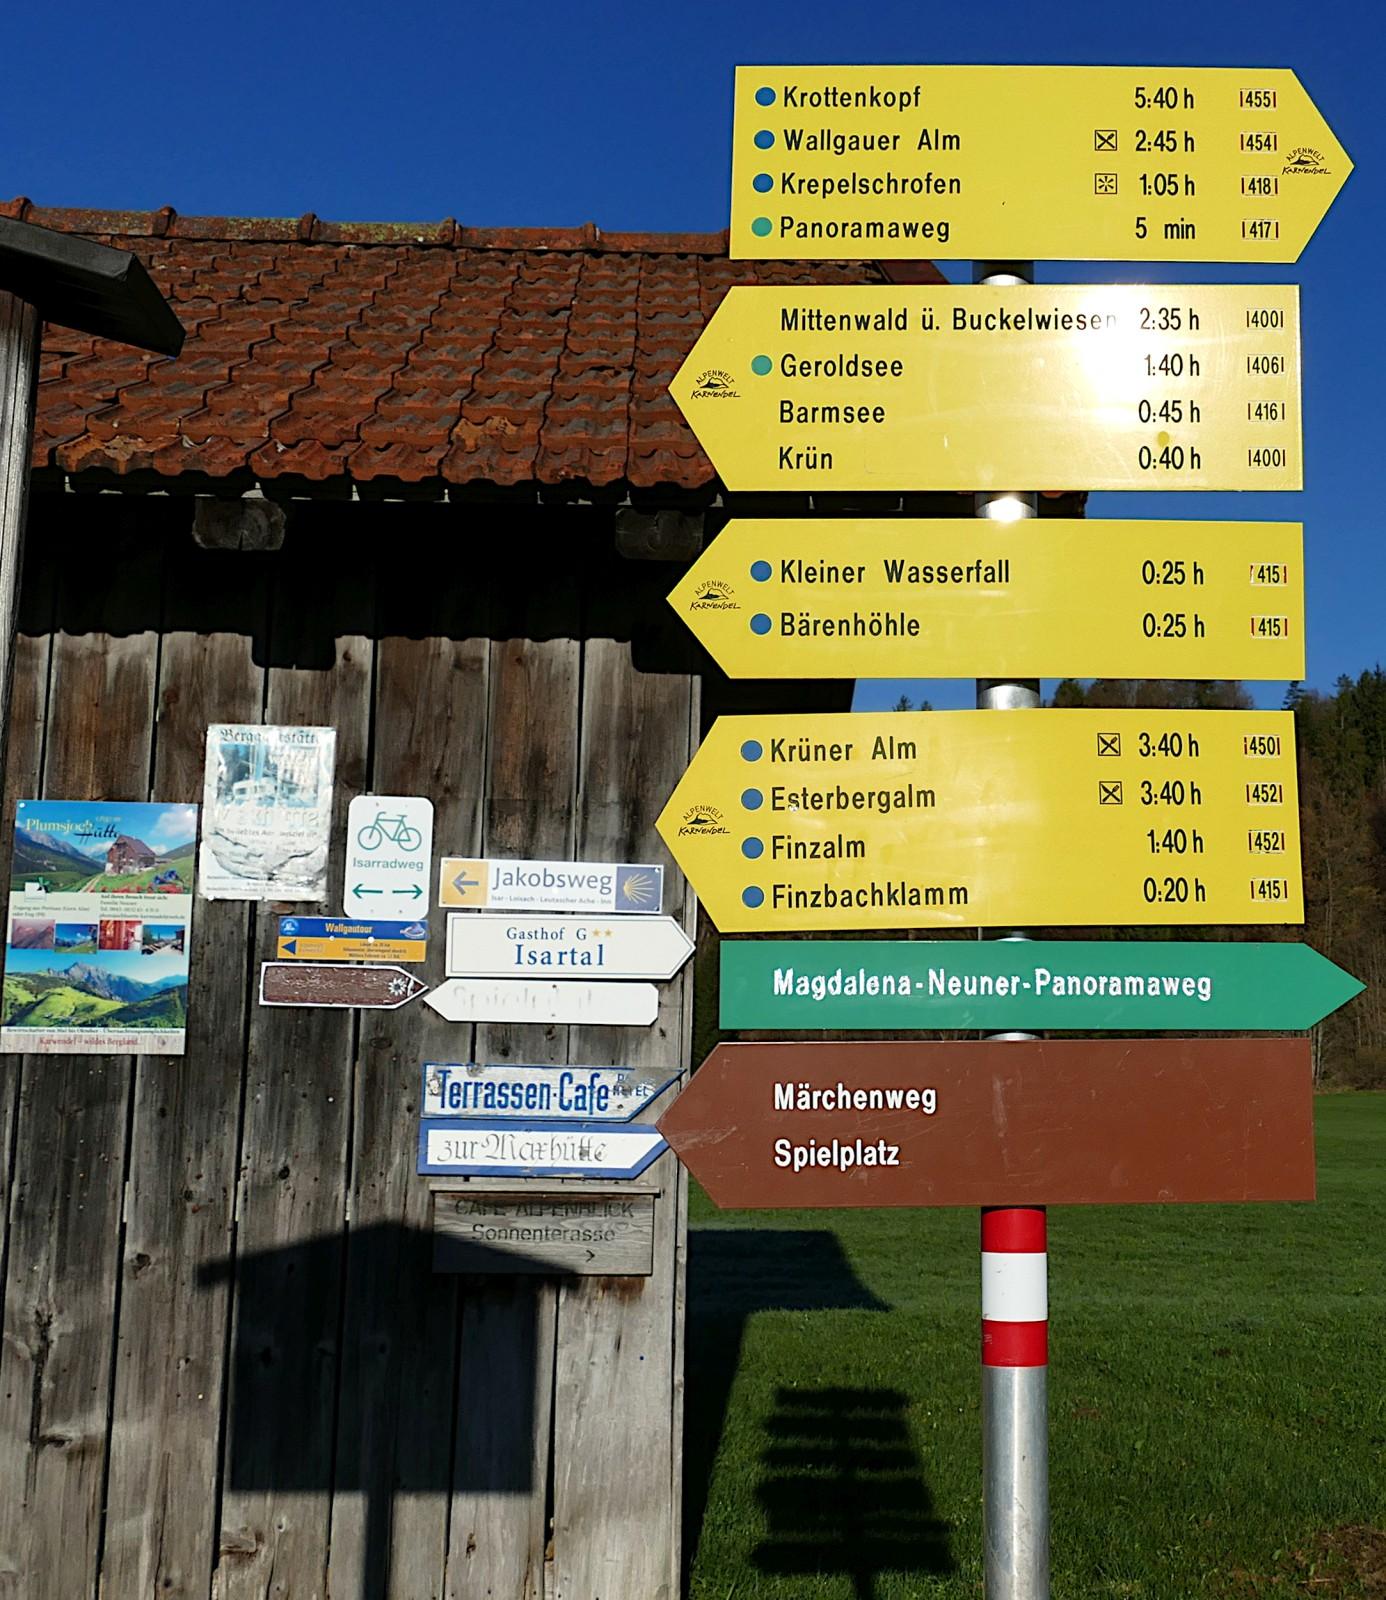 Wanderparadies Wallgau. hiking paradise